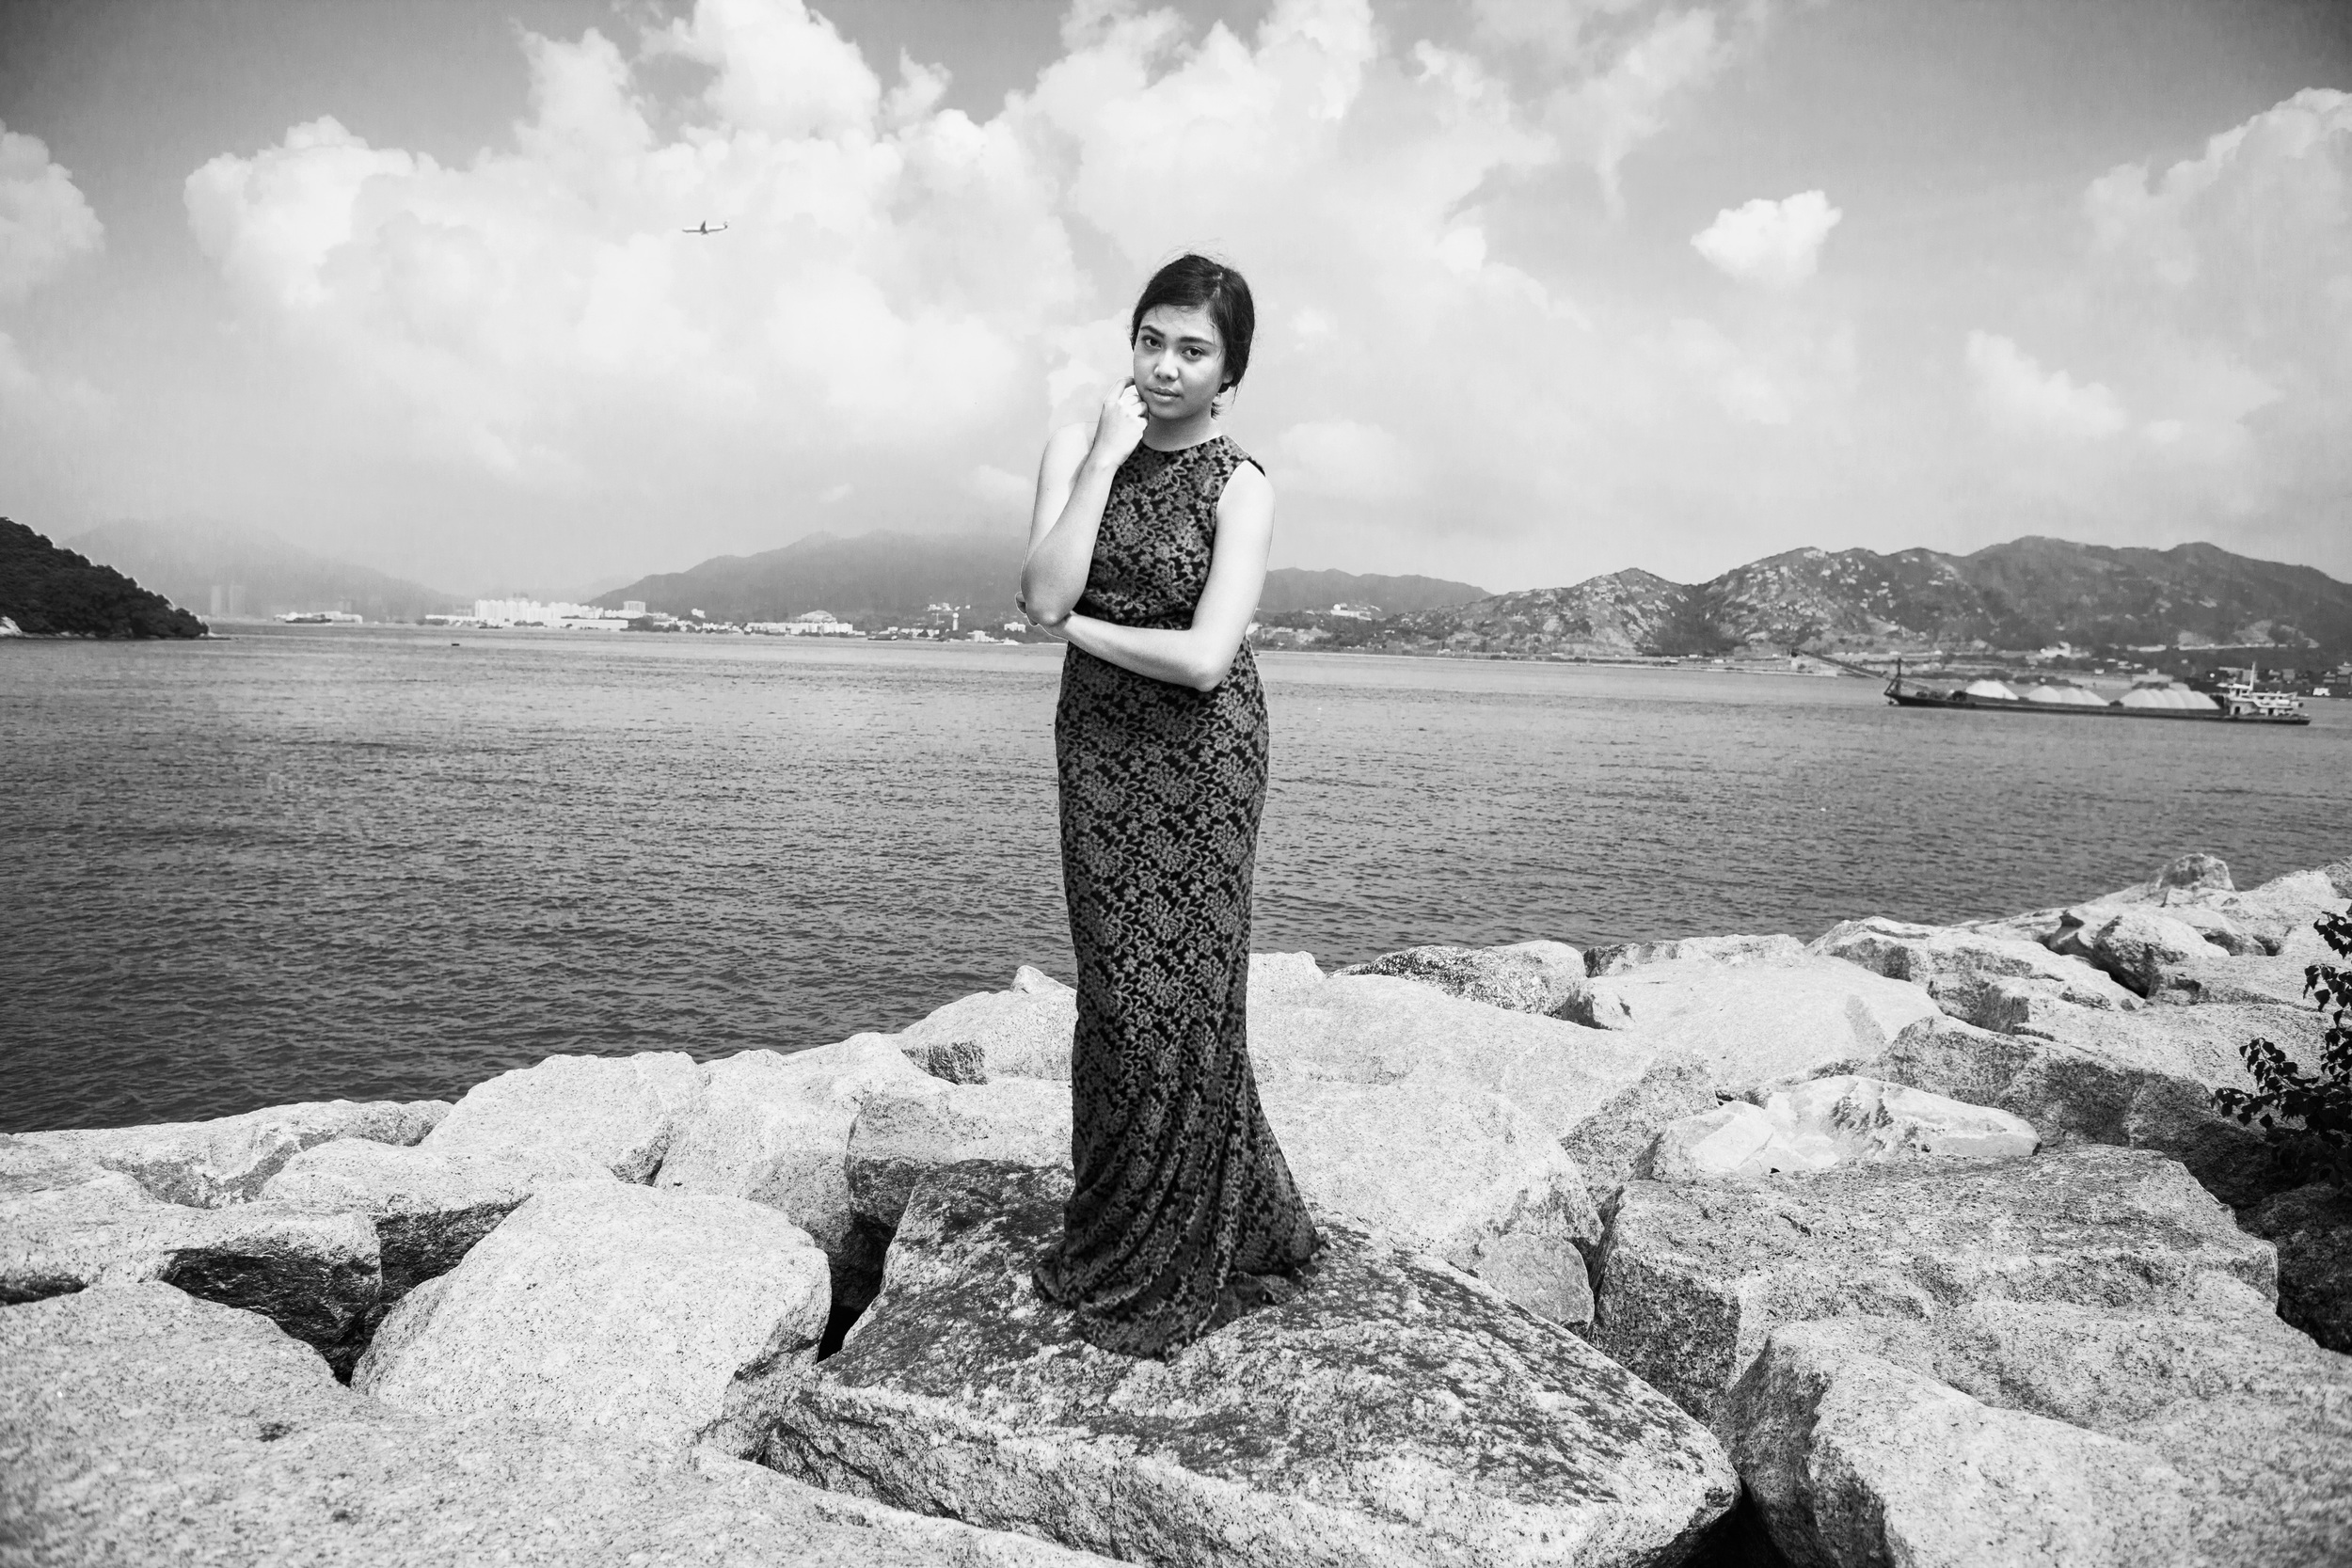 Jeline shot by Brian HK Chan (BCHK)